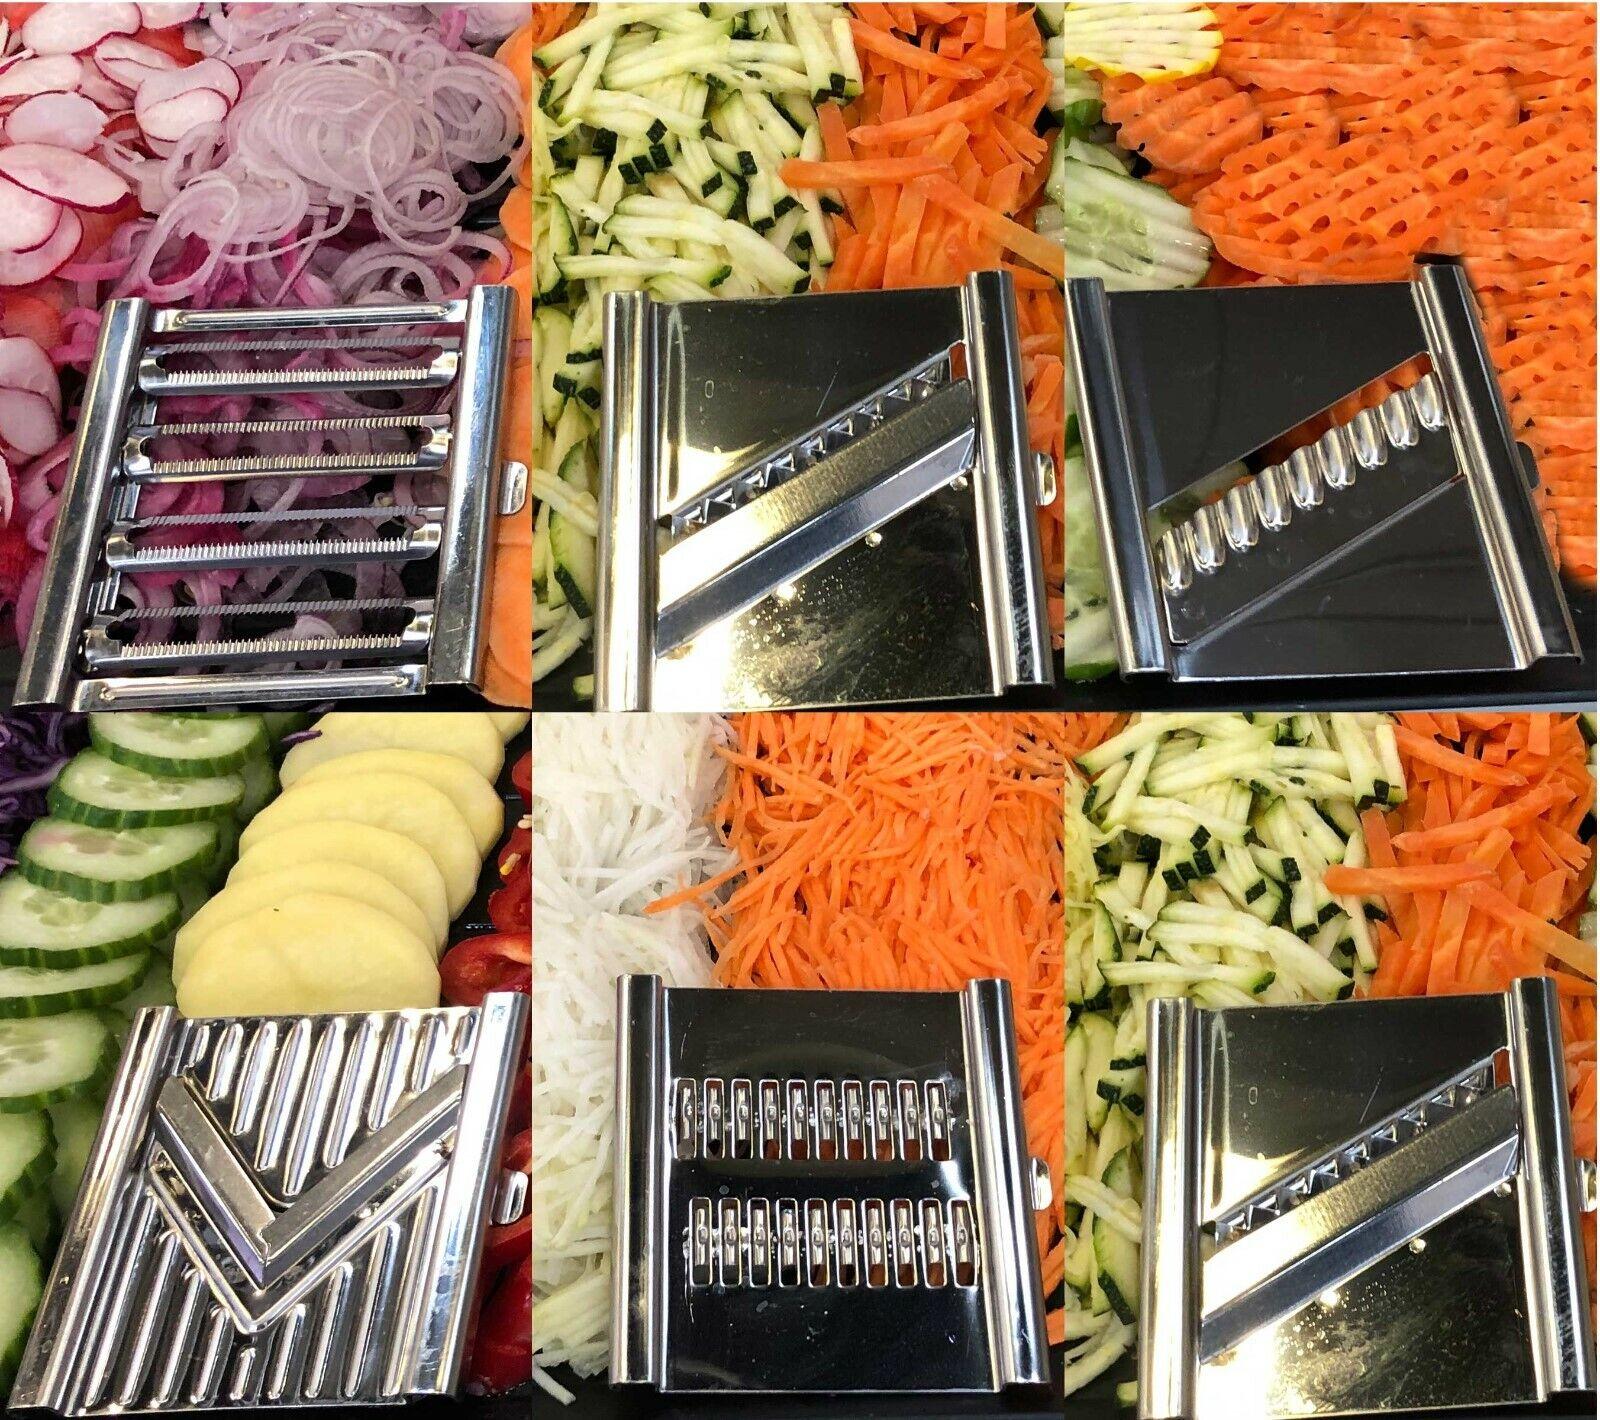 GIGANT Multihobel schneller 4 fach Gemüsehobel zusätzliche Einsätze Varianten